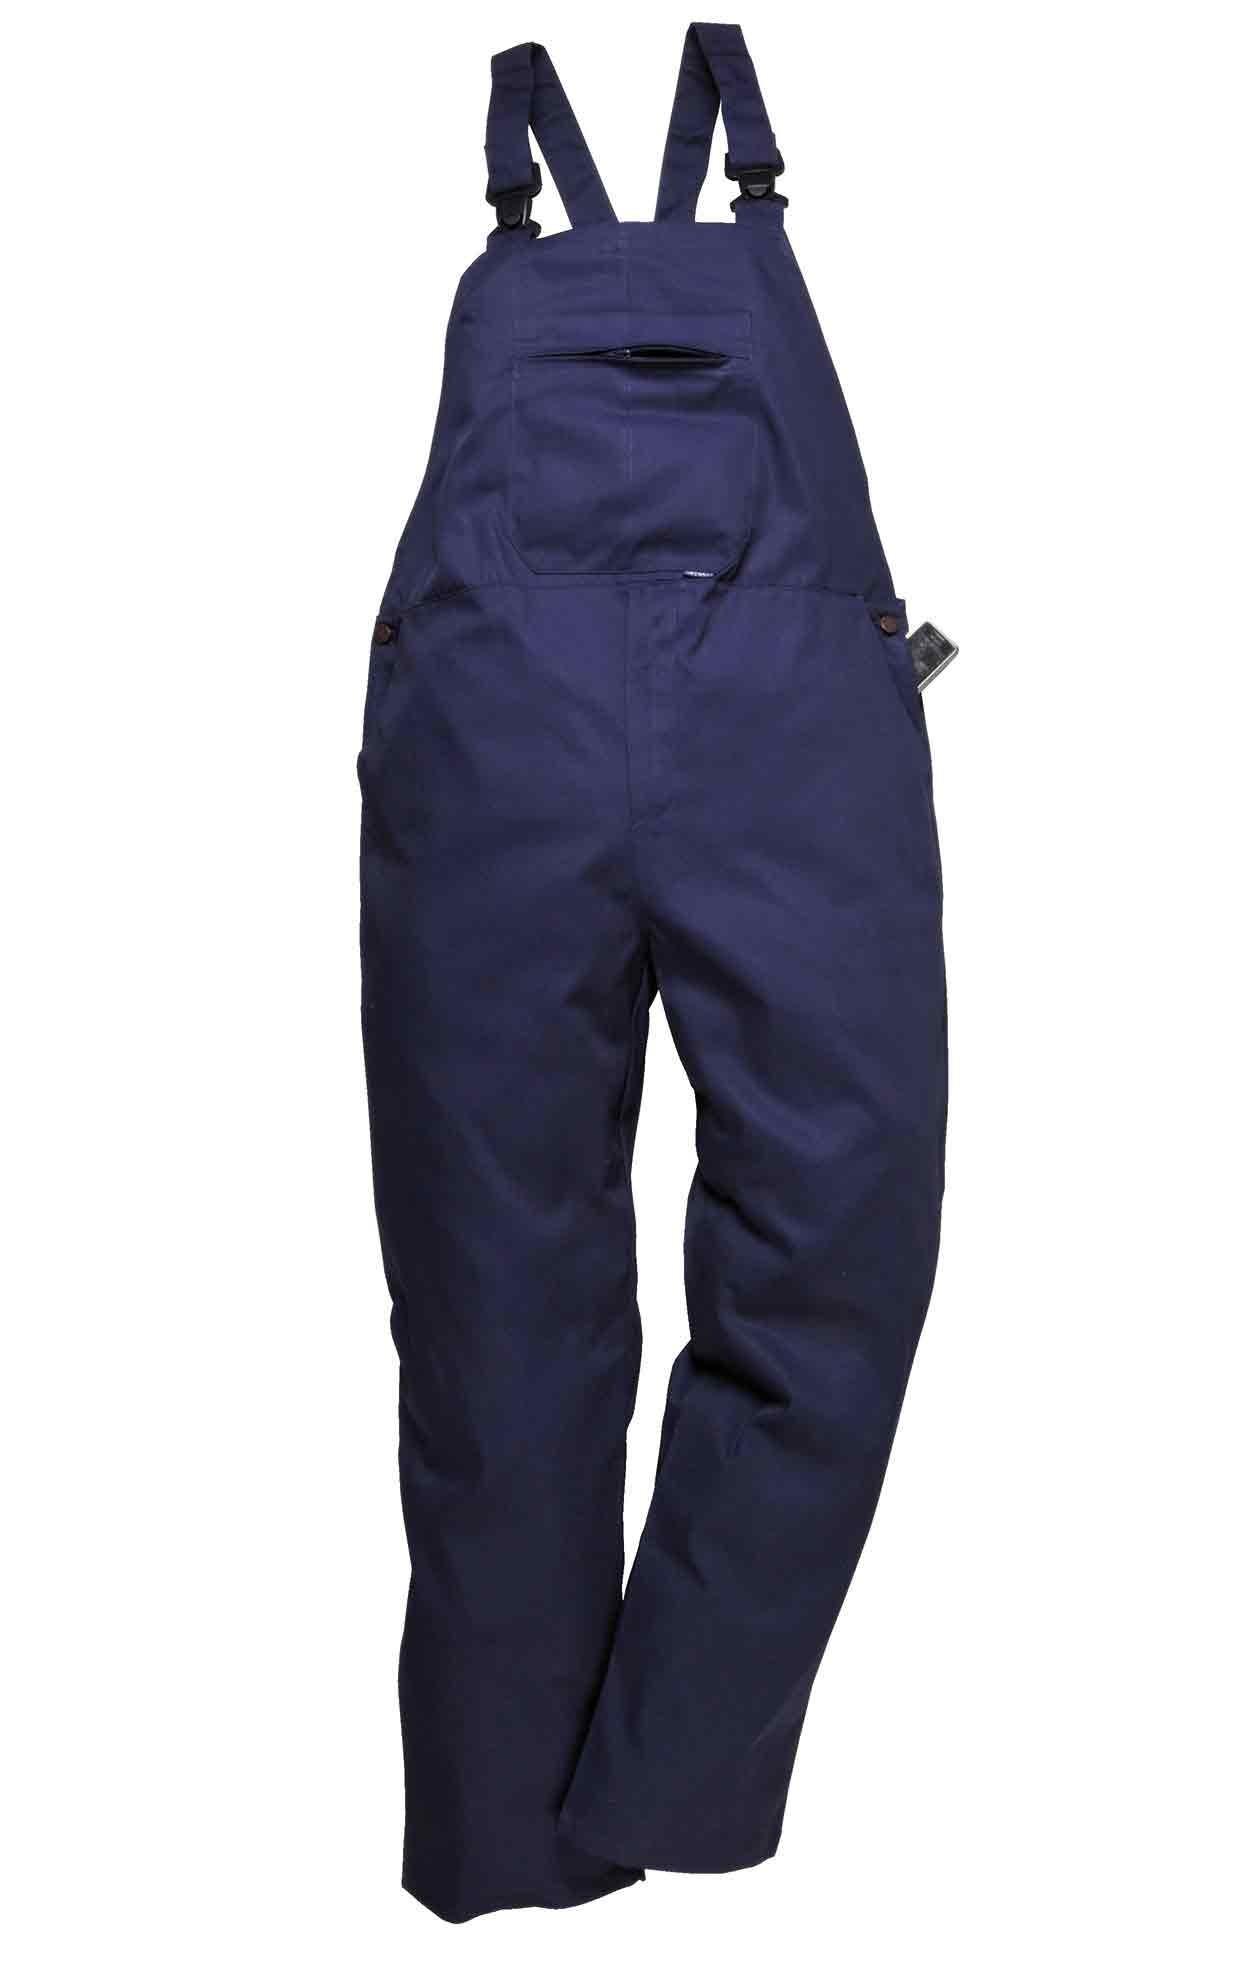 UK EU Portwest Workwear Burnley Bib and Brace C875